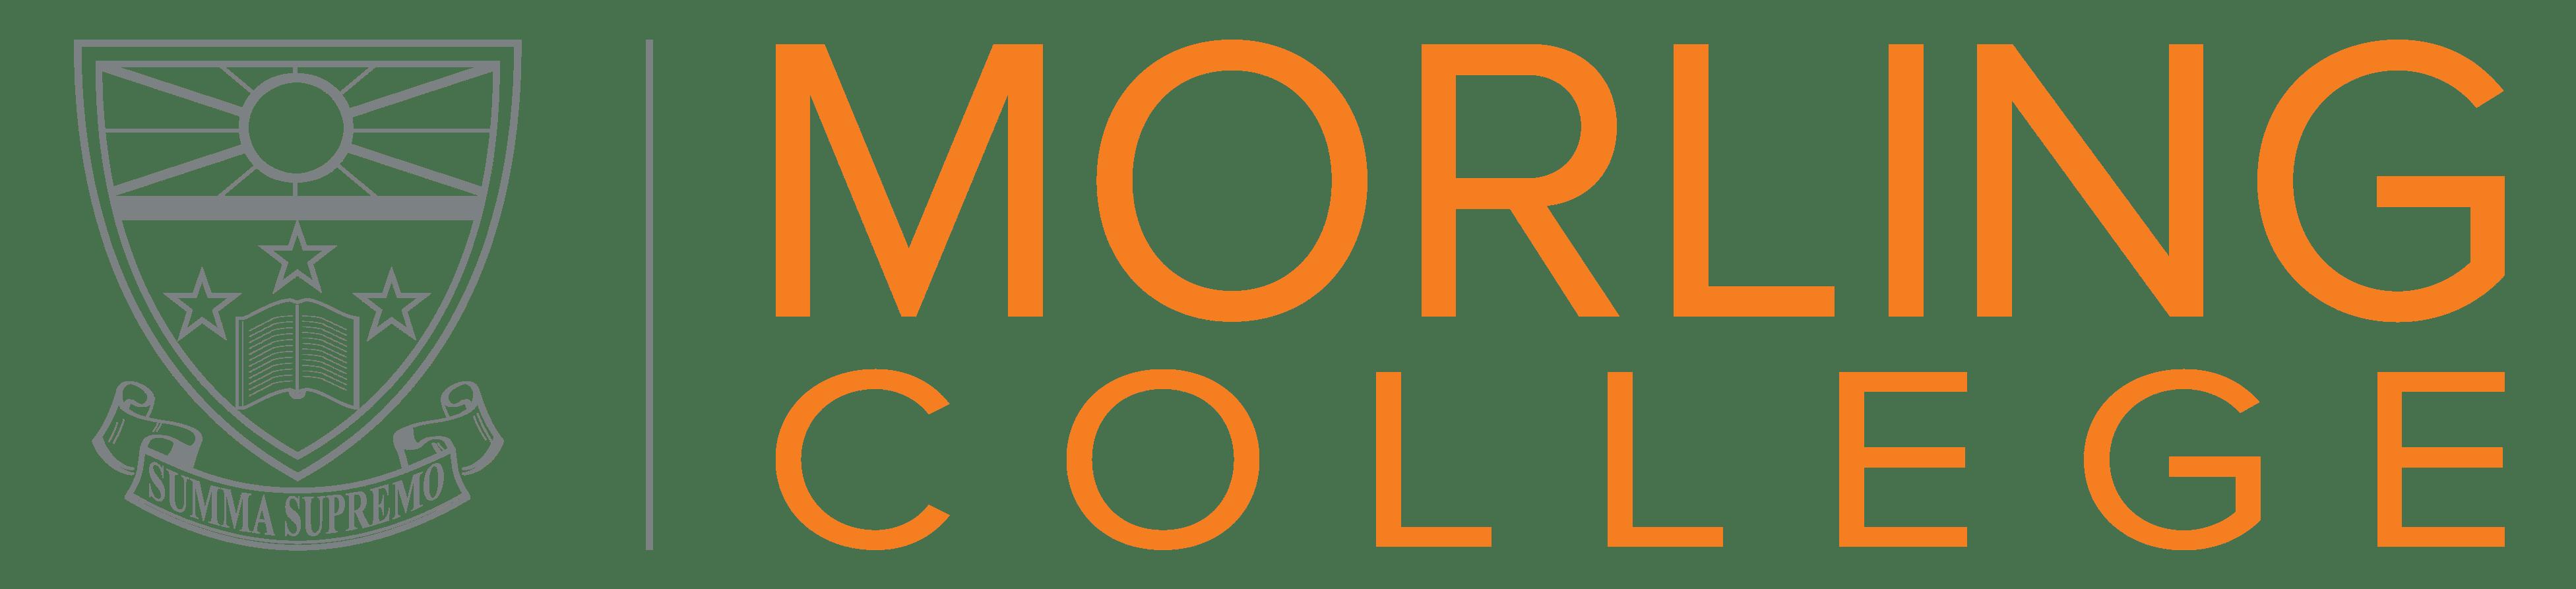 Partnership logo: Morling College